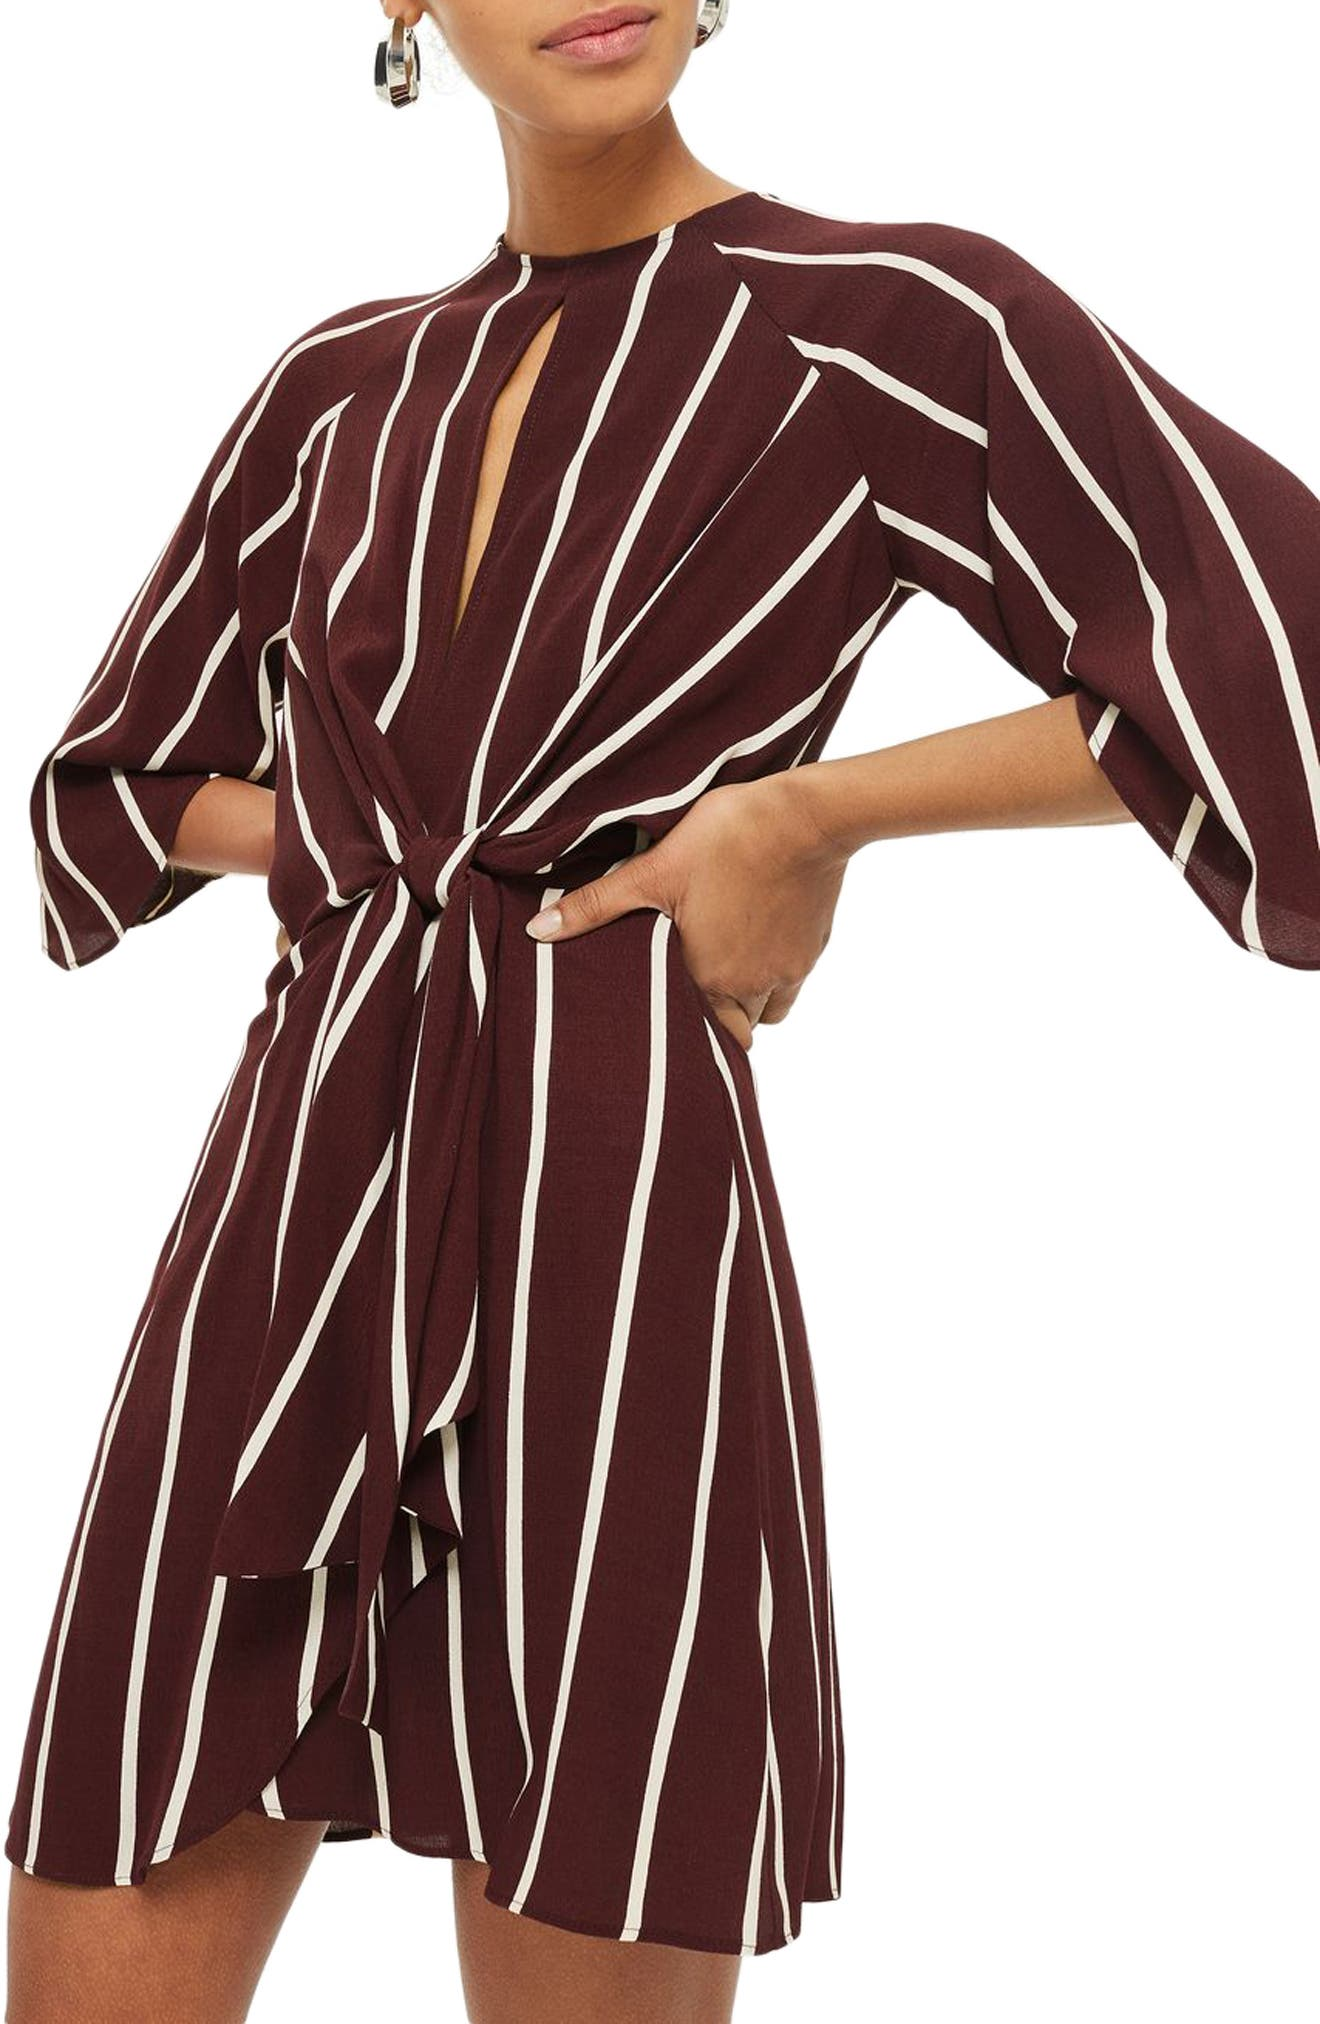 Stripe Knot Front Minidress,                         Main,                         color, Burgundy